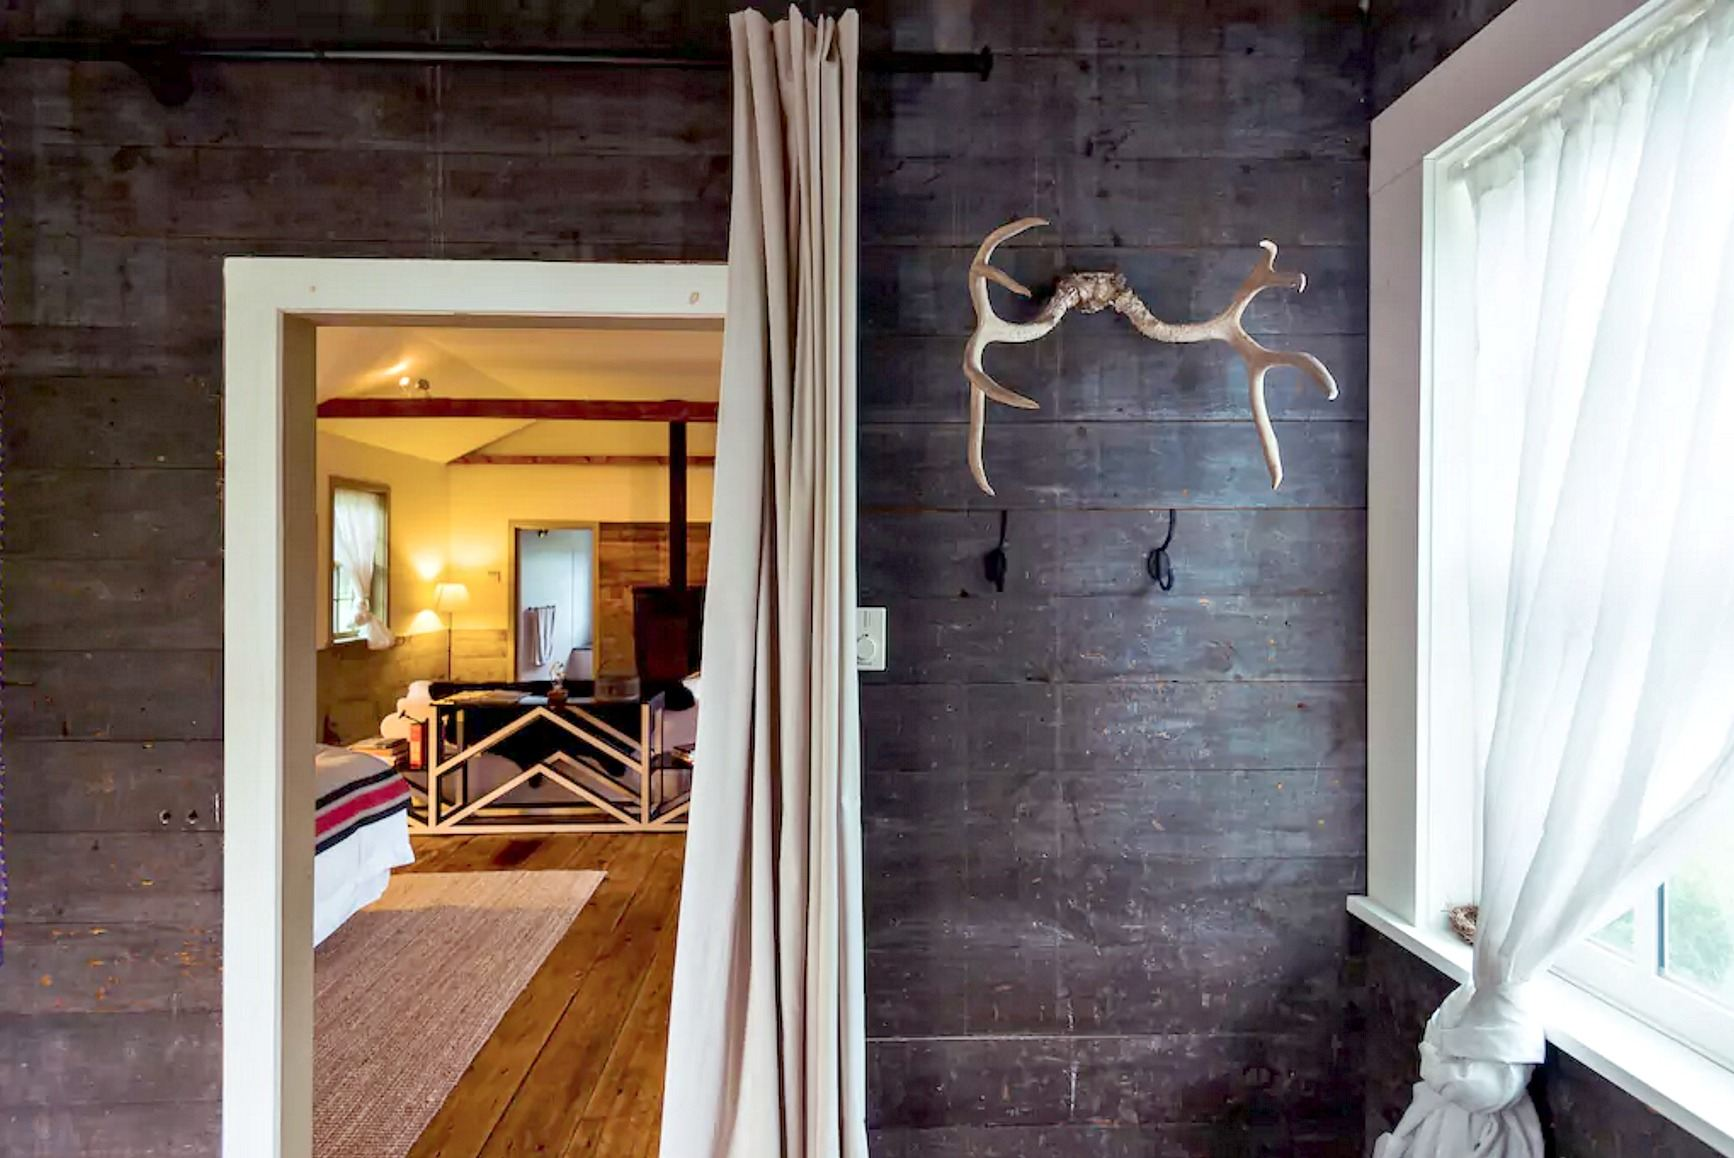 catskills-schoolhouse-airbnb-14